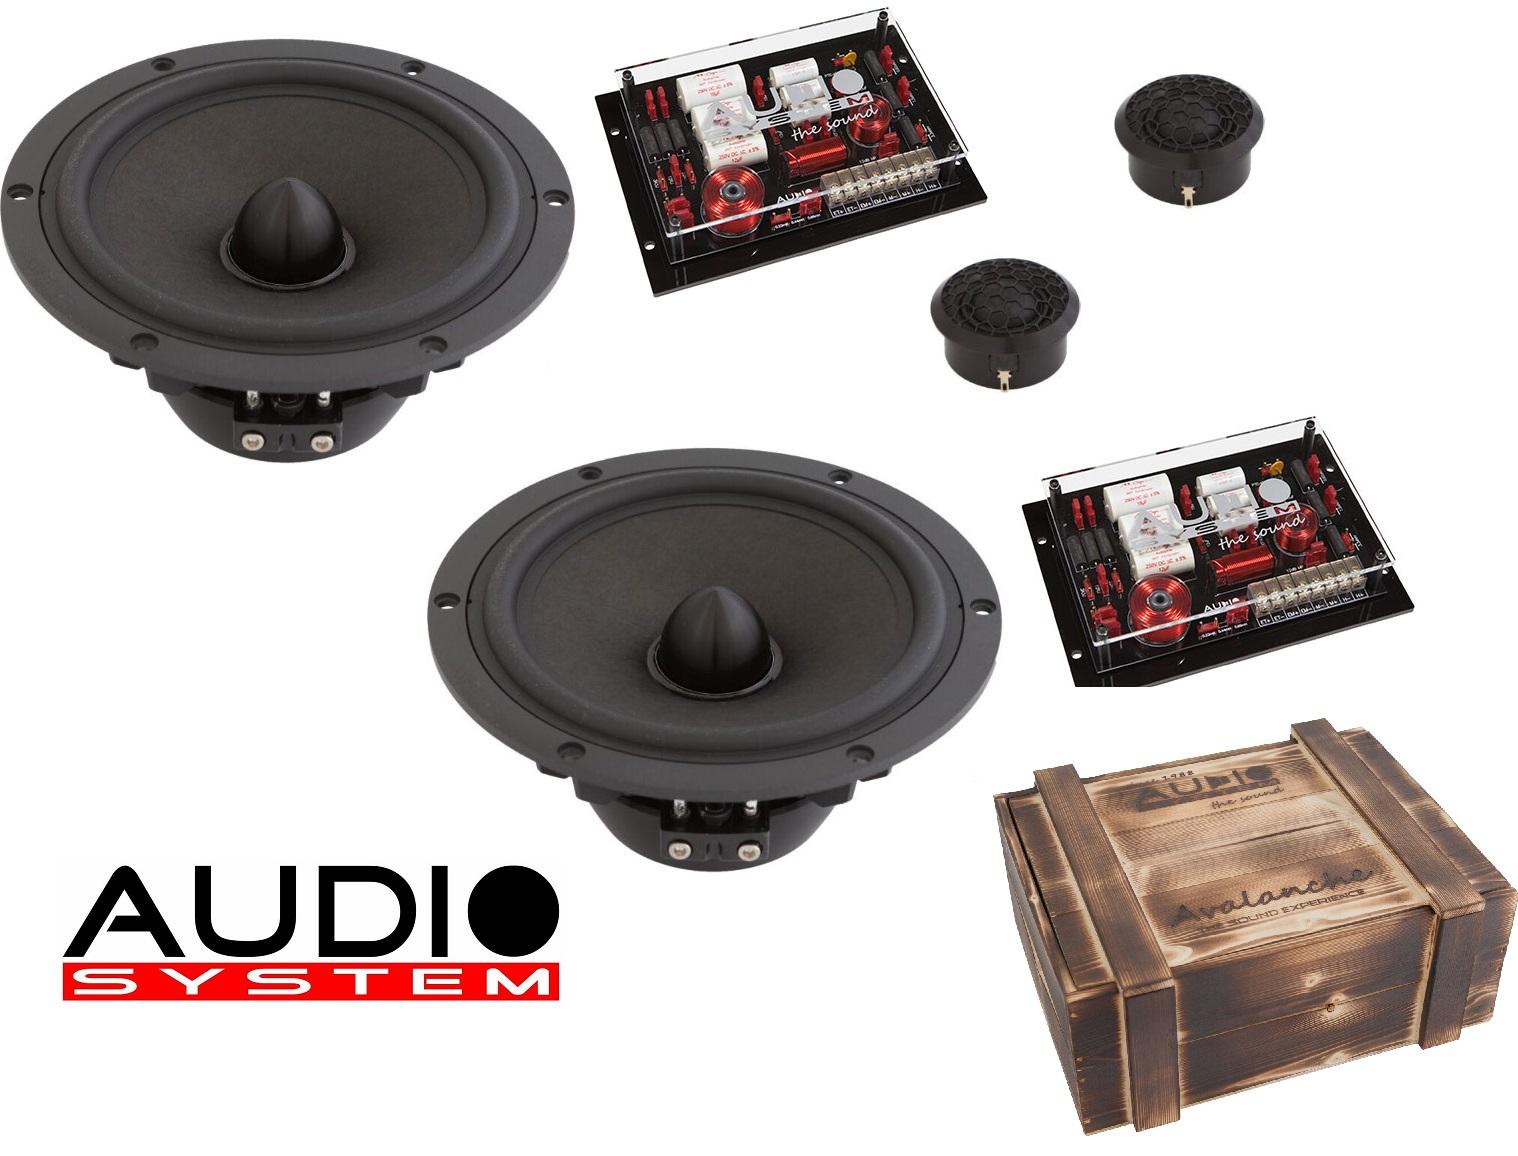 Audio System AV ALANCHE 165-2 PASSIV AV ALANCHE SERIES 16,5 cm 2-Wege HIGH END System